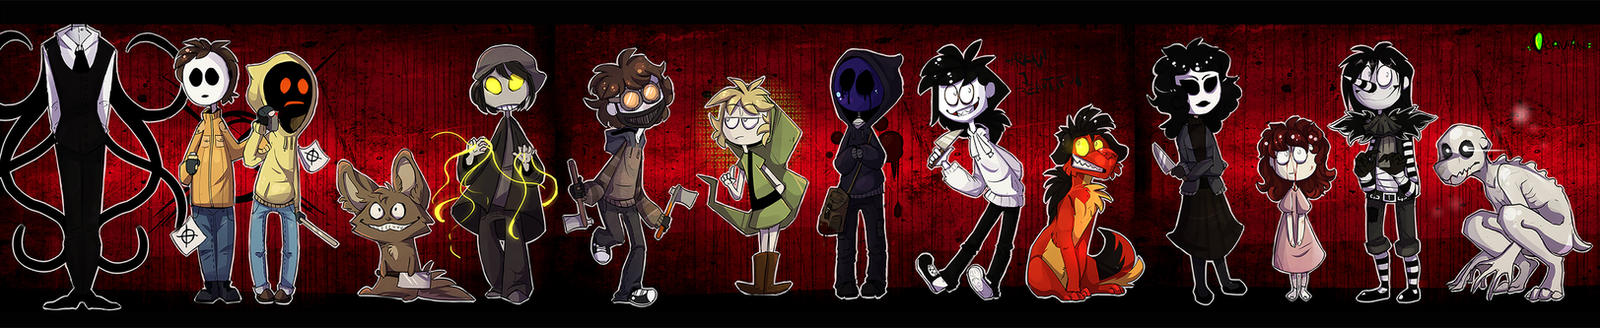  Creepypasta Fanart  Cartoon CP Monsters